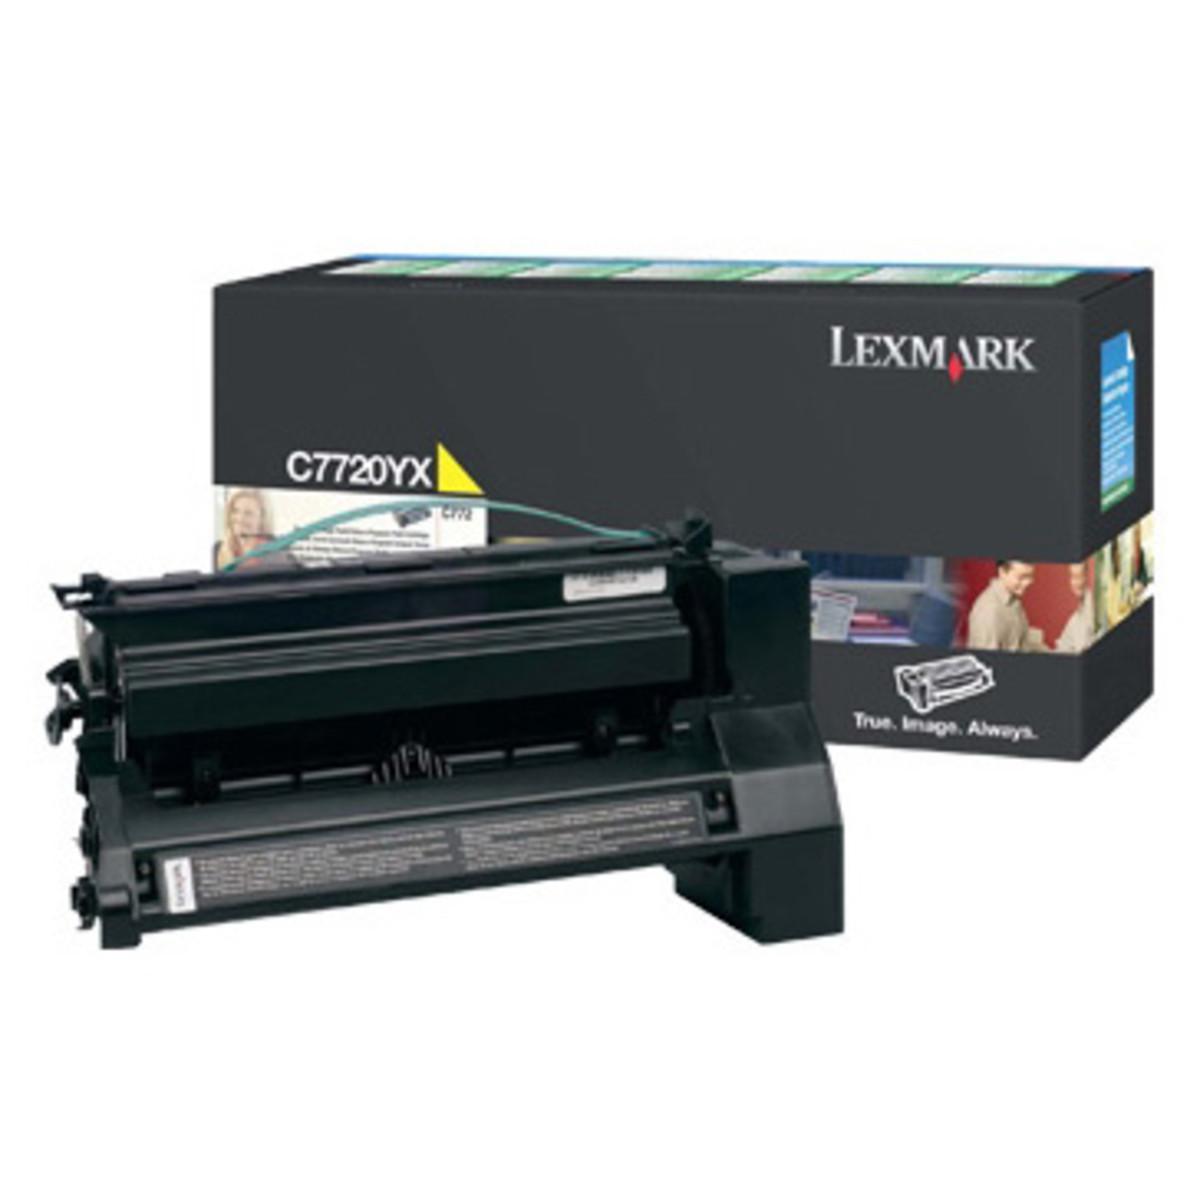 Lexmark C7720YX Yellow Toner Cartridge High Yield